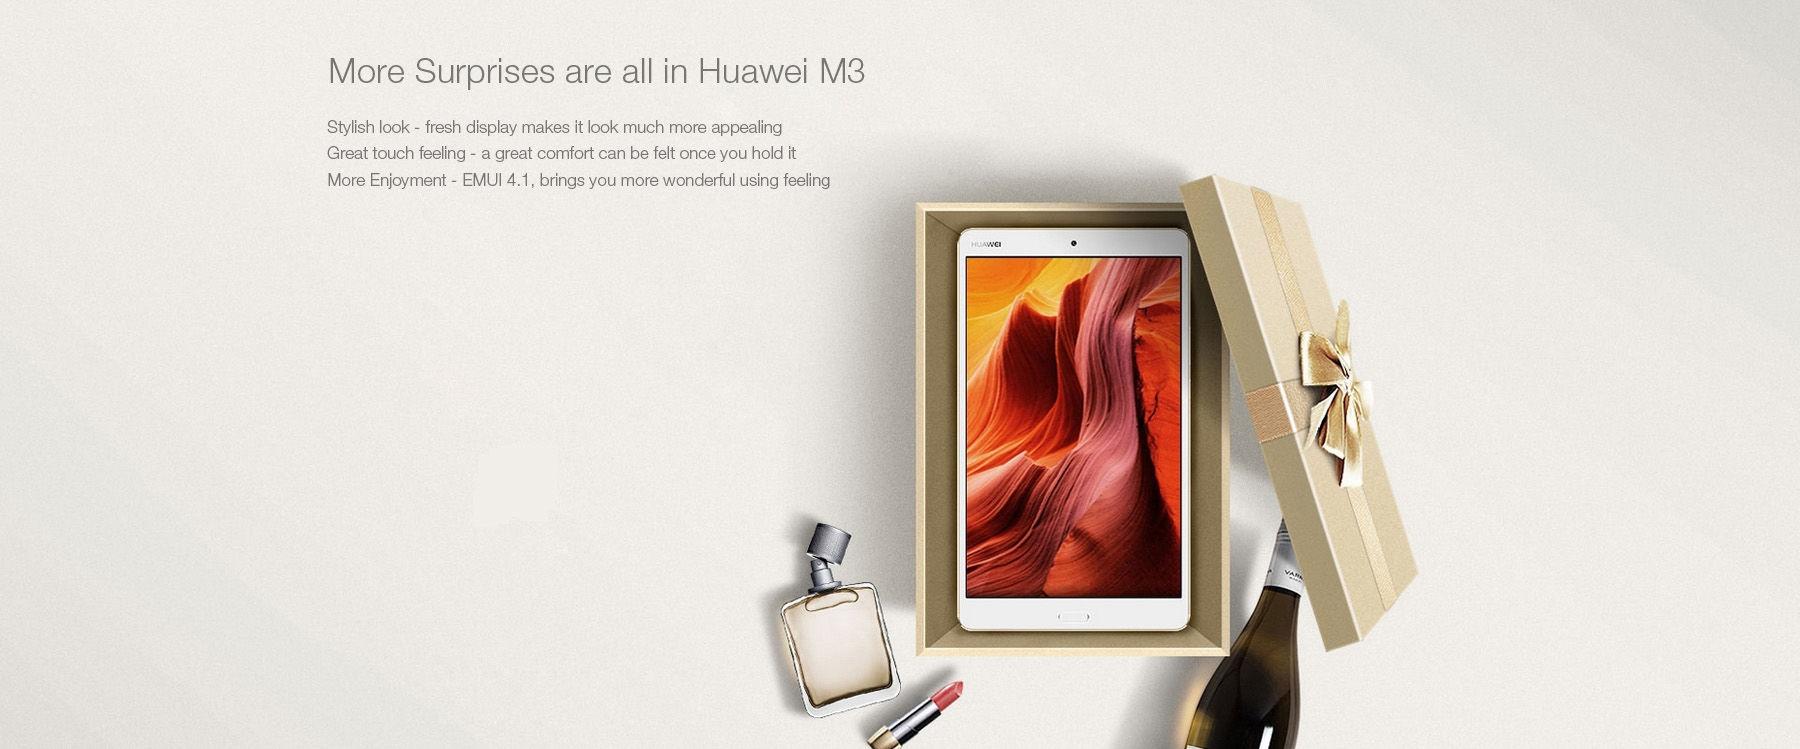 Huawei M3 ( BTV-W09 ) 8.4 inch 2K IPS Screen Tablet PC Android 6.0 Kirin 950 Octa Core 2.3GHz 4GB RAM 32GB ROM Dual WiFi 5100mAh Battery Bluetooth 4.1